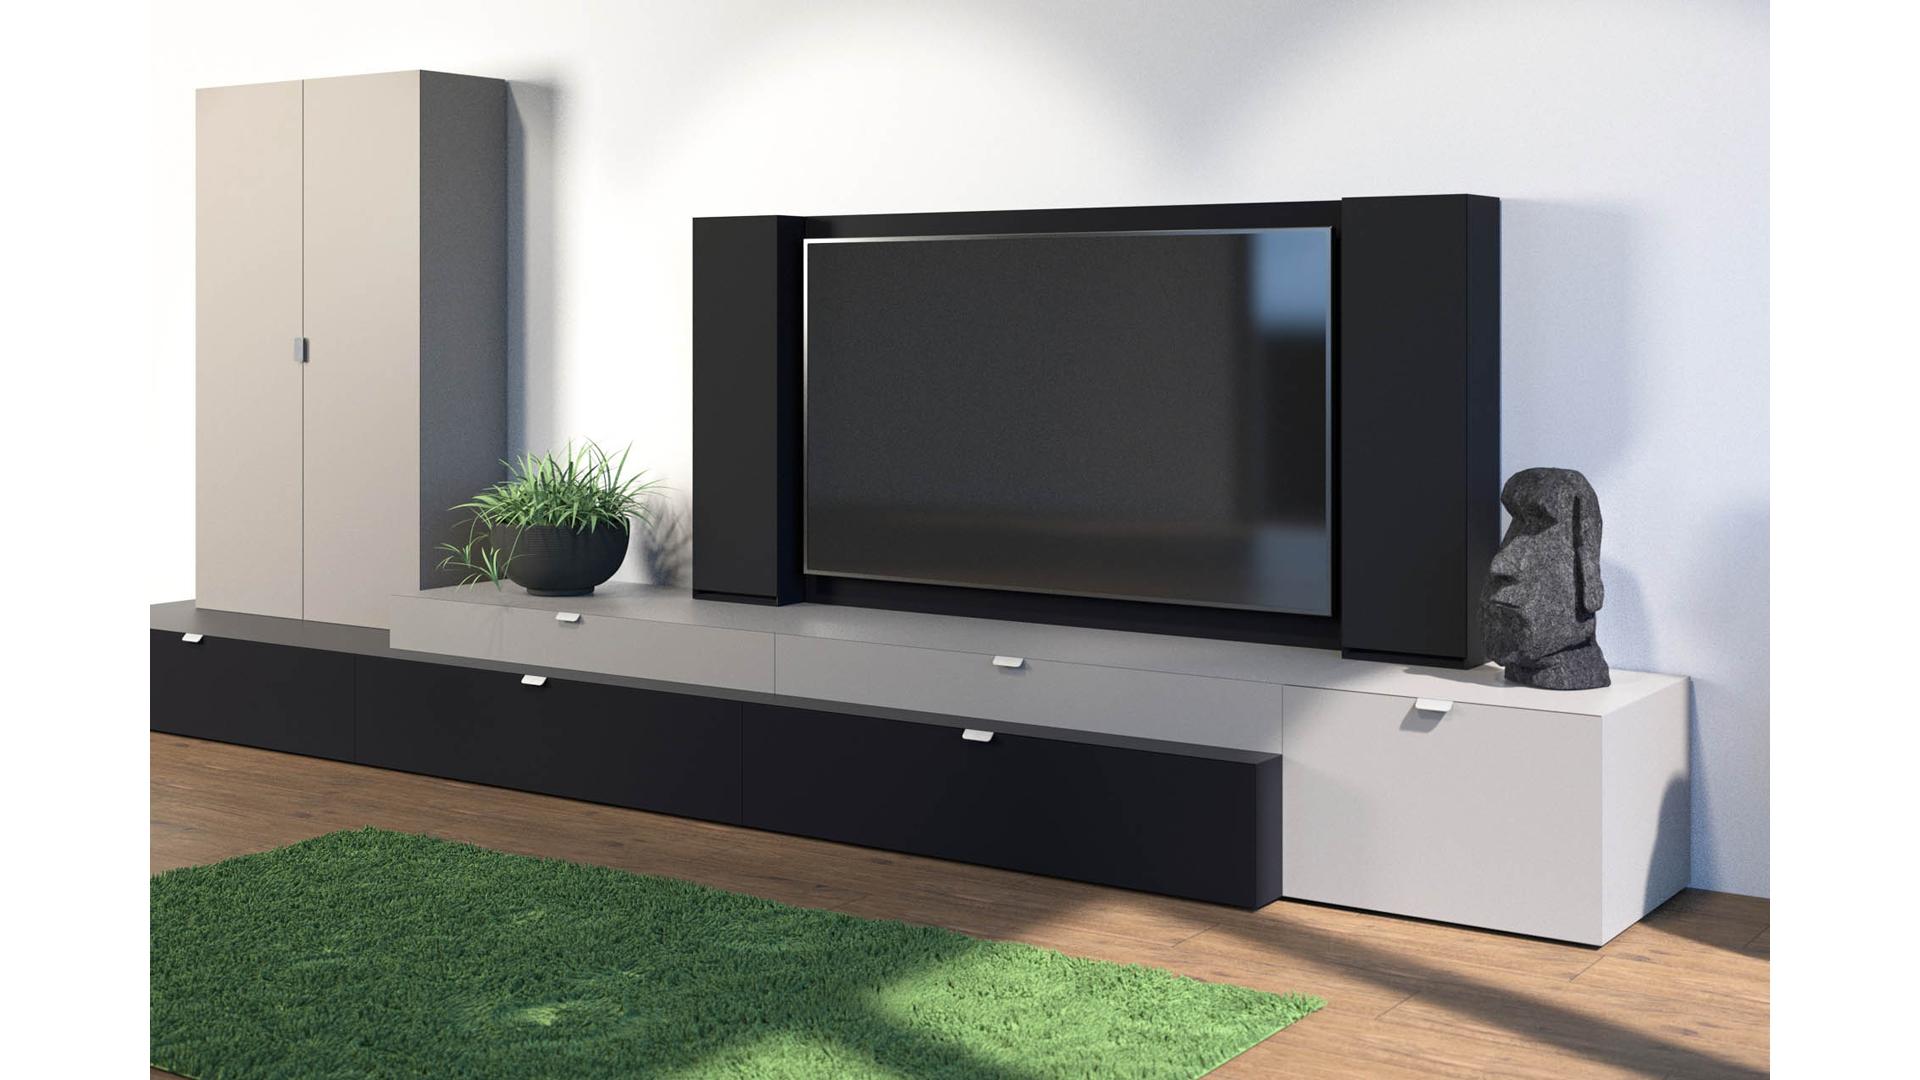 Meuble Tv Hifi Intégré meuble tv sur mesure swiss hd hifi | meubles bise